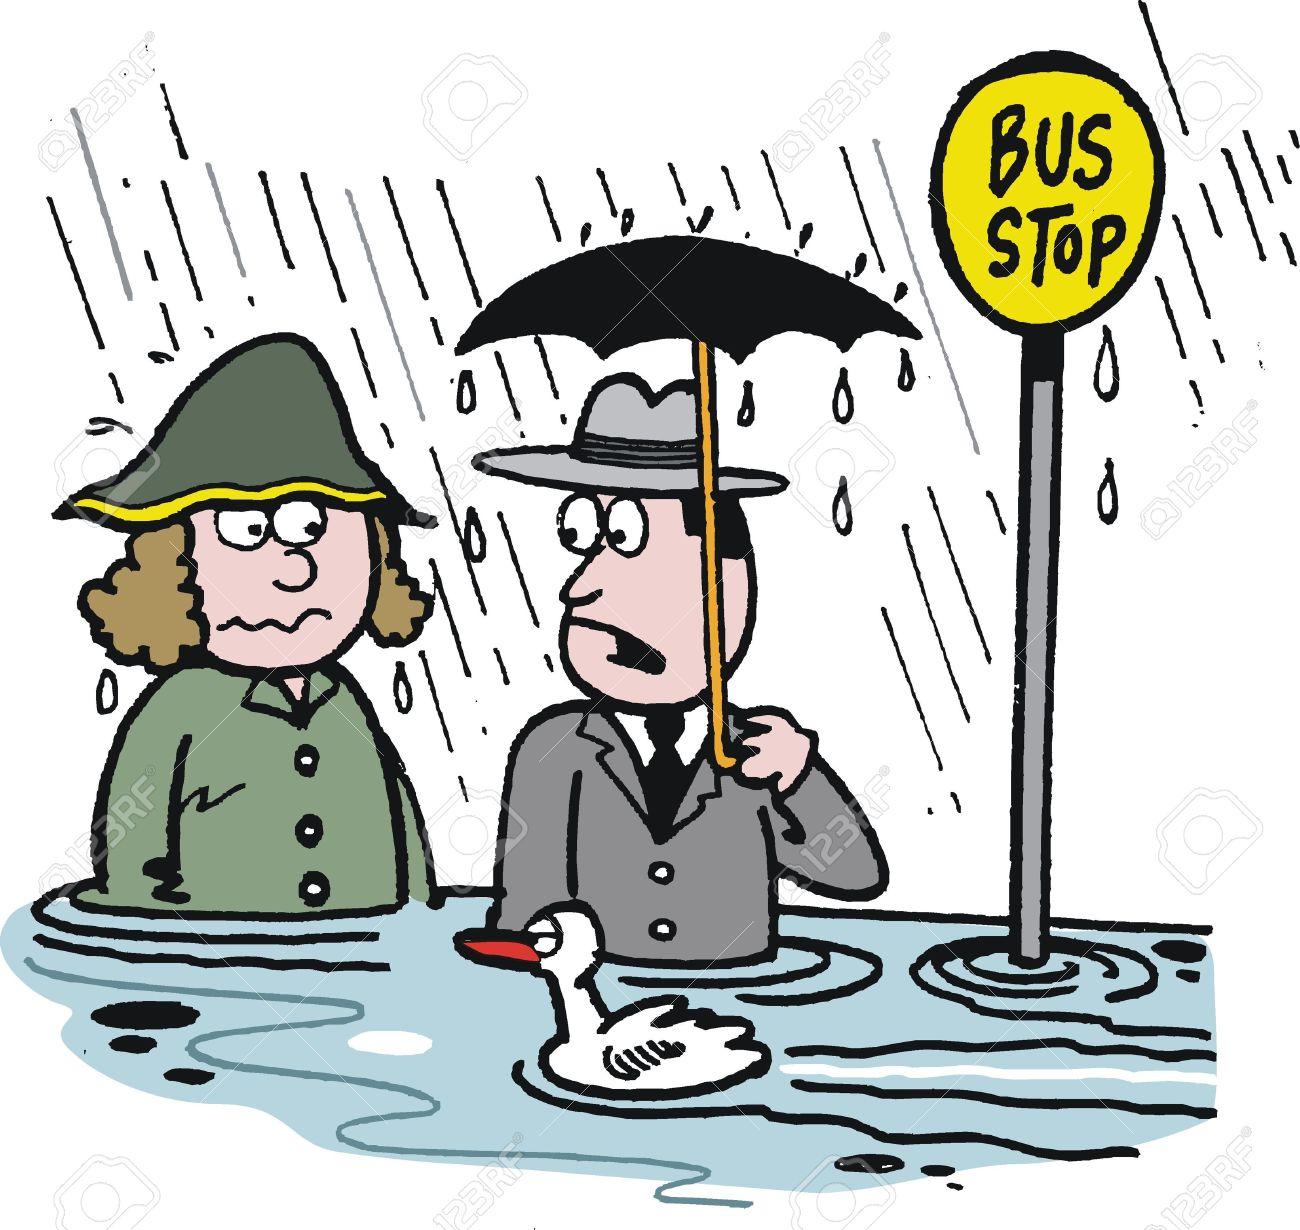 Flood clipart cartoon, Flood cartoon Transparent FREE for.